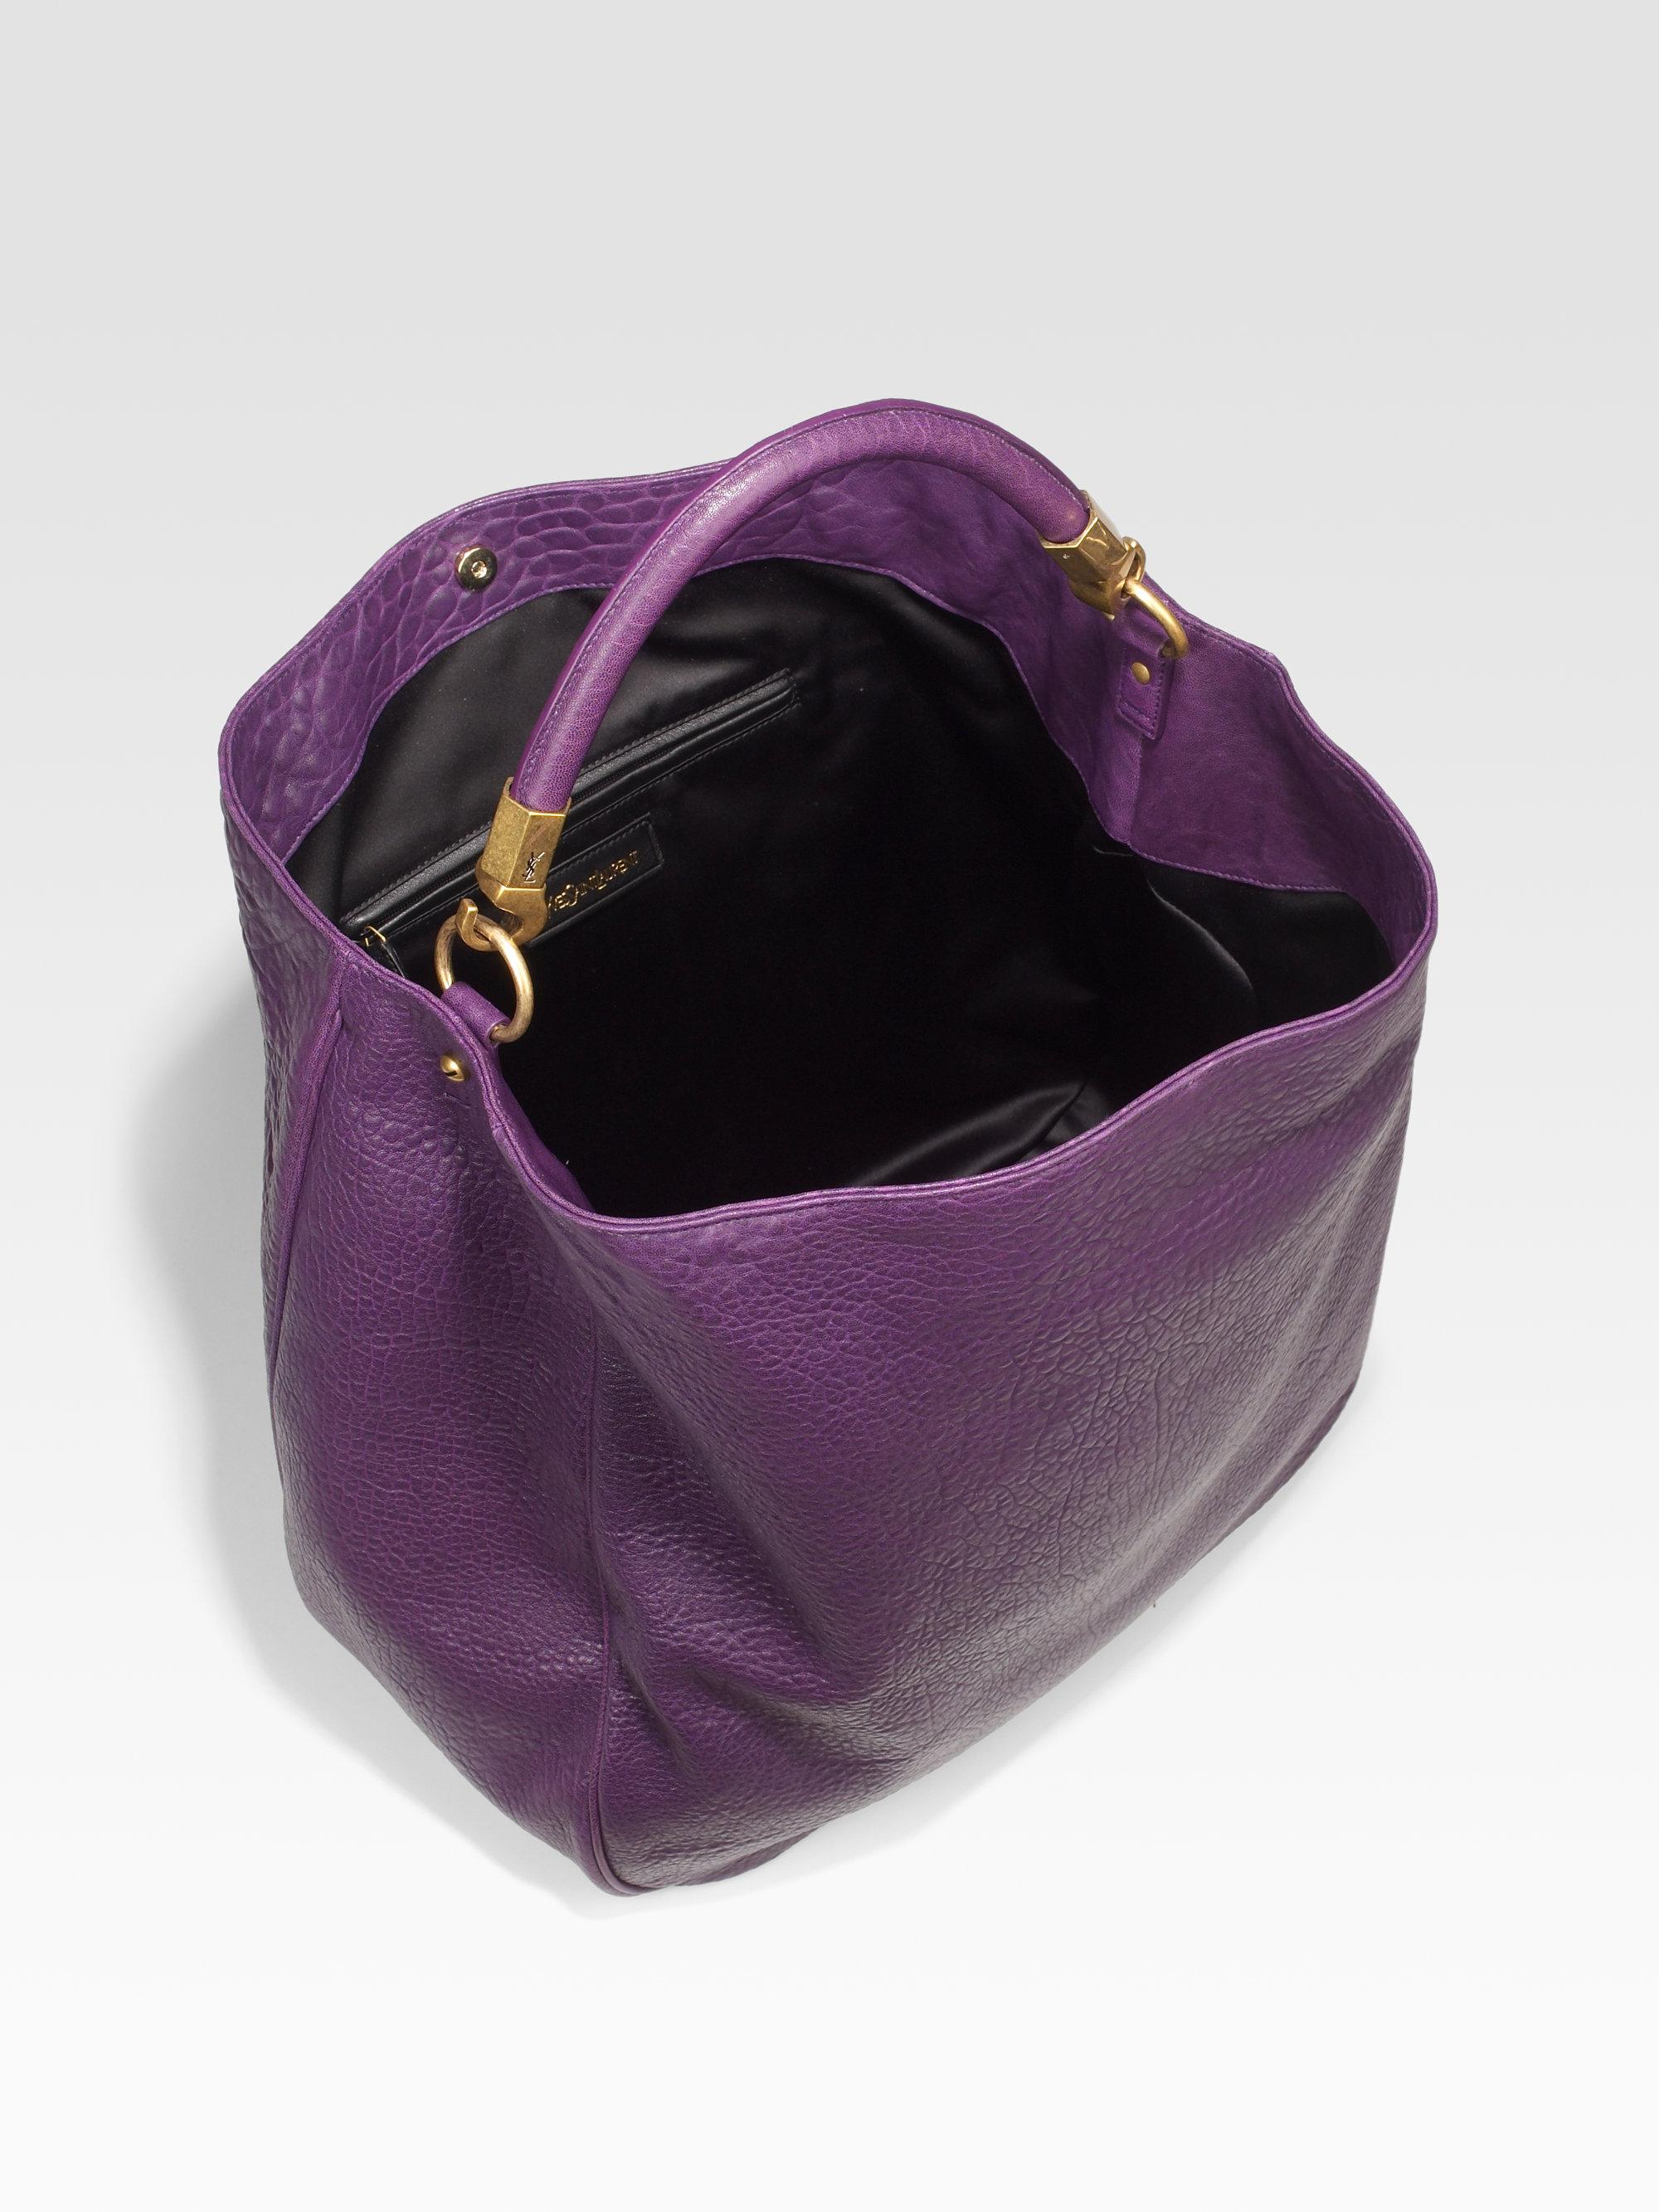 ysl card holder - Saint laurent Roady Pebbled Leather Hobo in Purple (violet) | Lyst